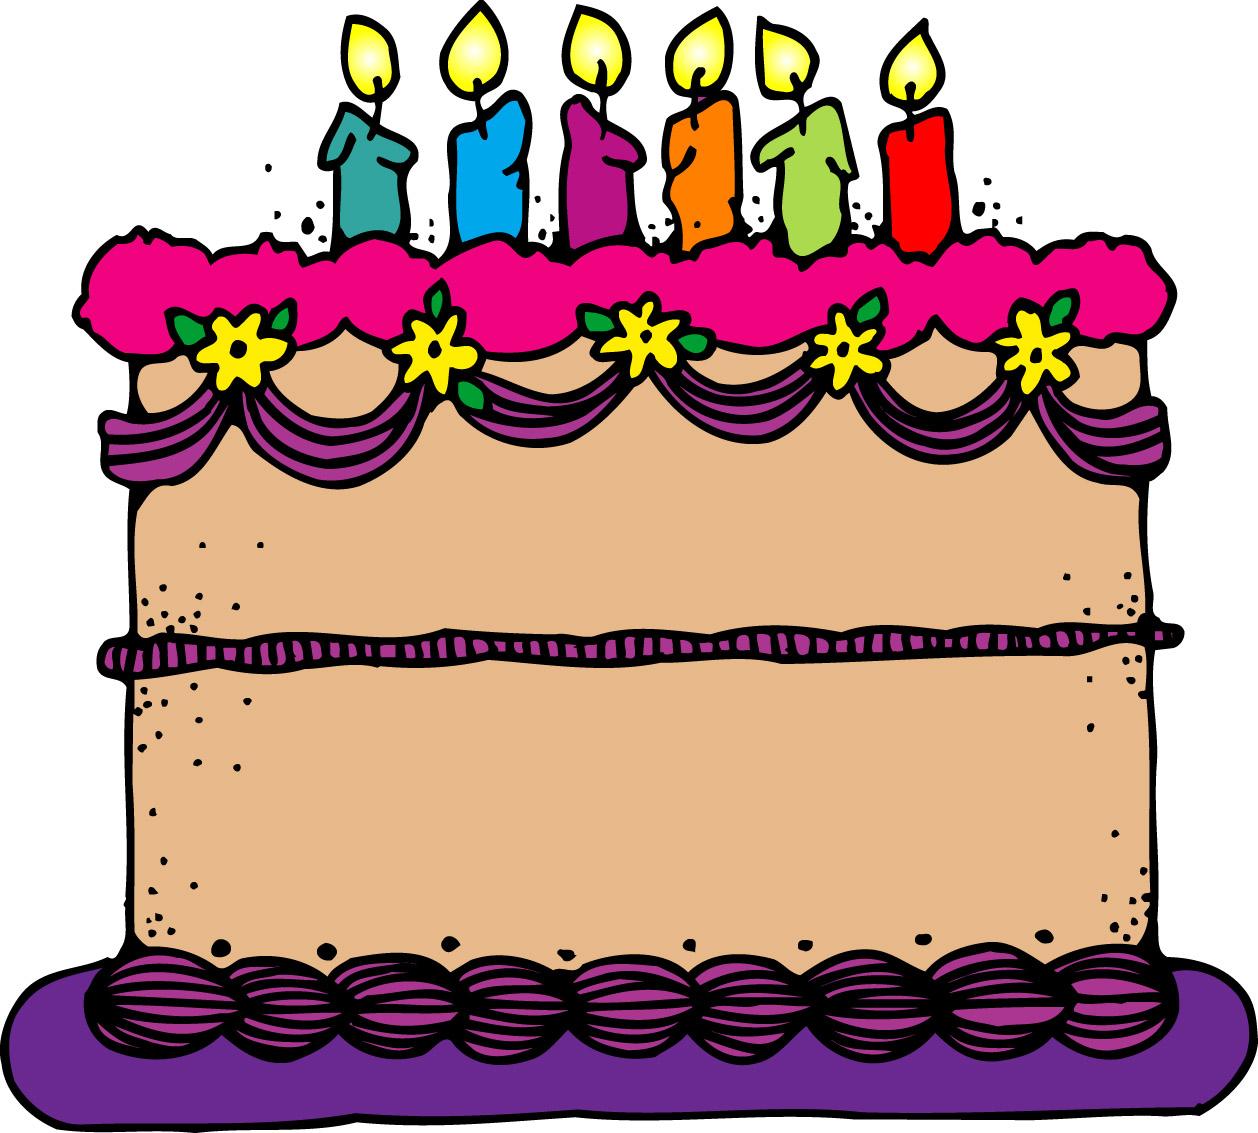 Birthday cake animated clipart